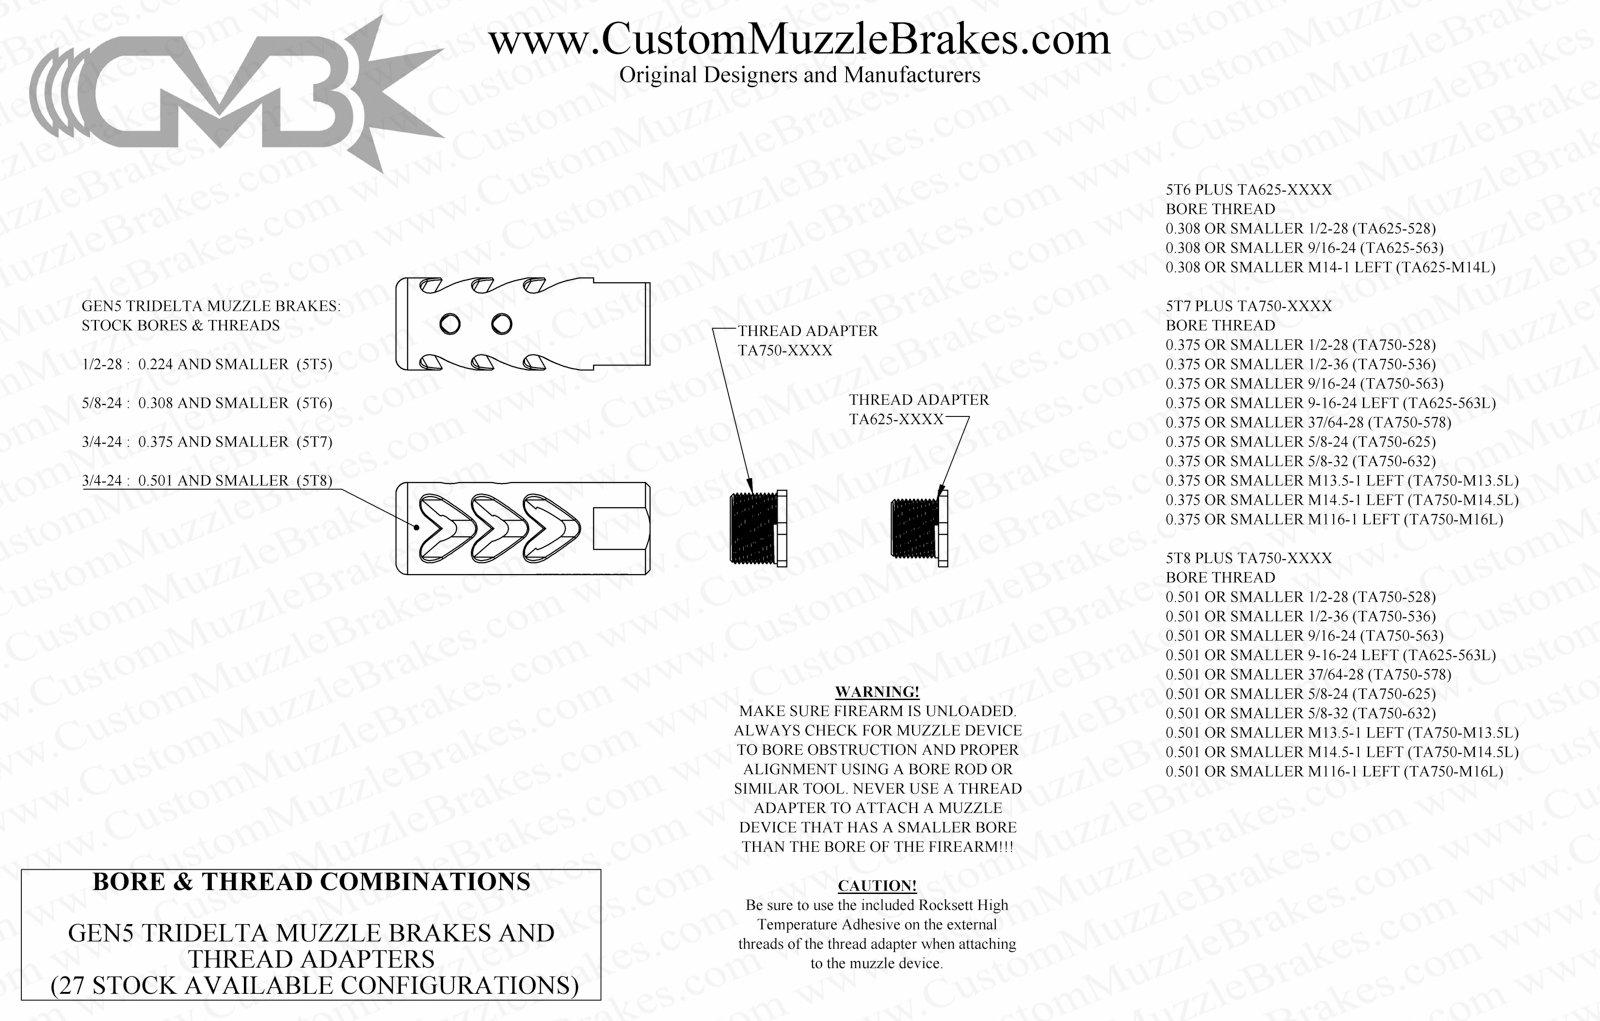 GEN5 TriDelta Extreme Performance Muzzle Brake